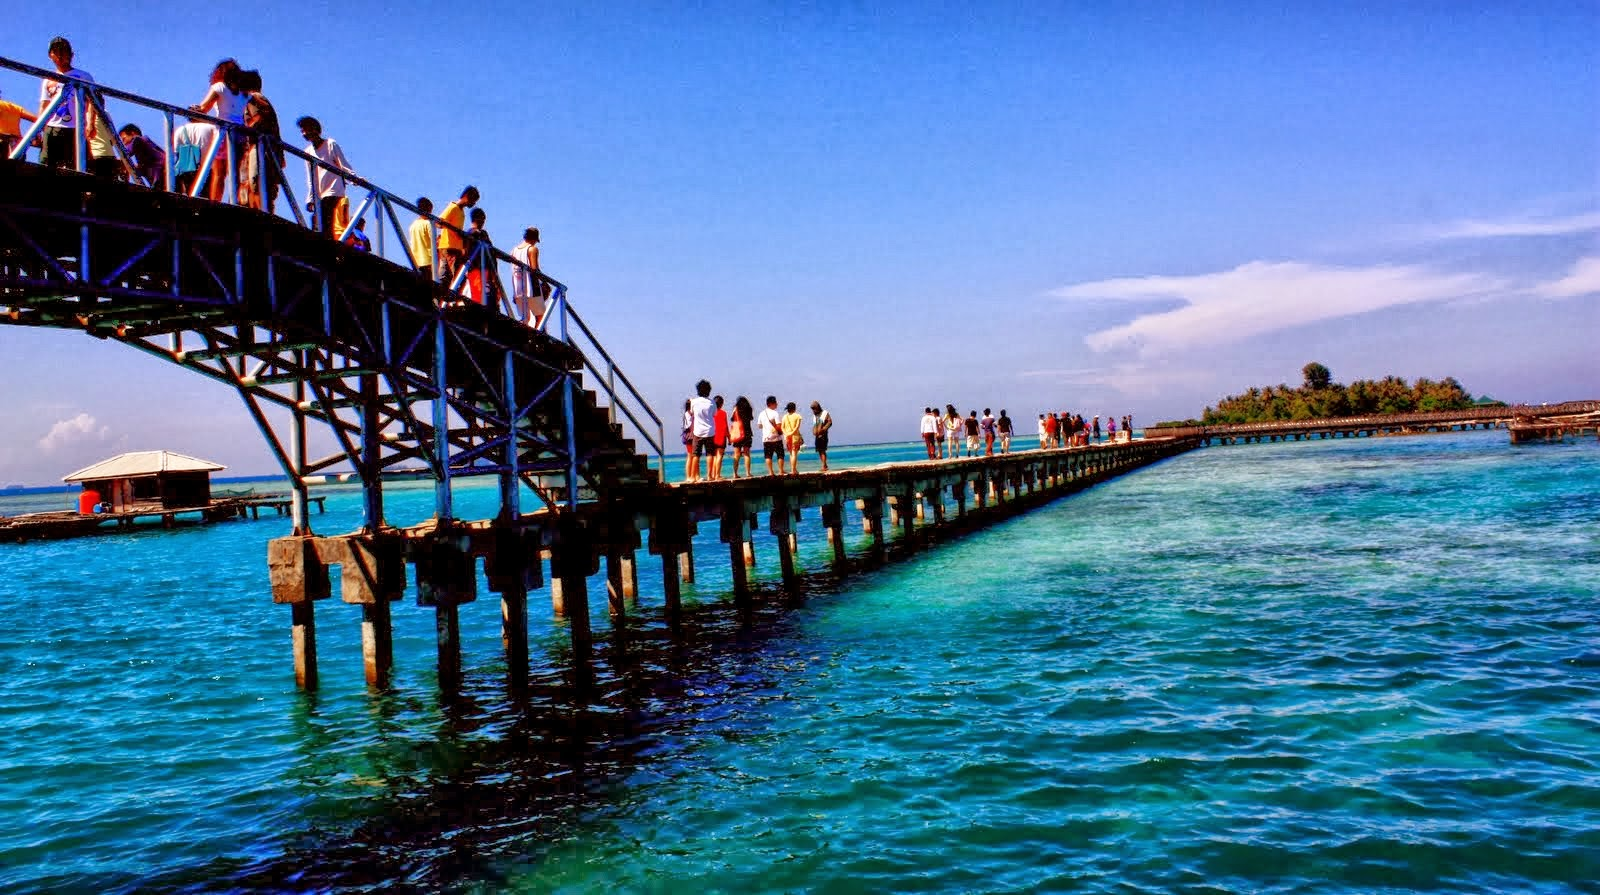 Paket Wisata Pulau Tidung  | Rekreasi Pulau Seribu